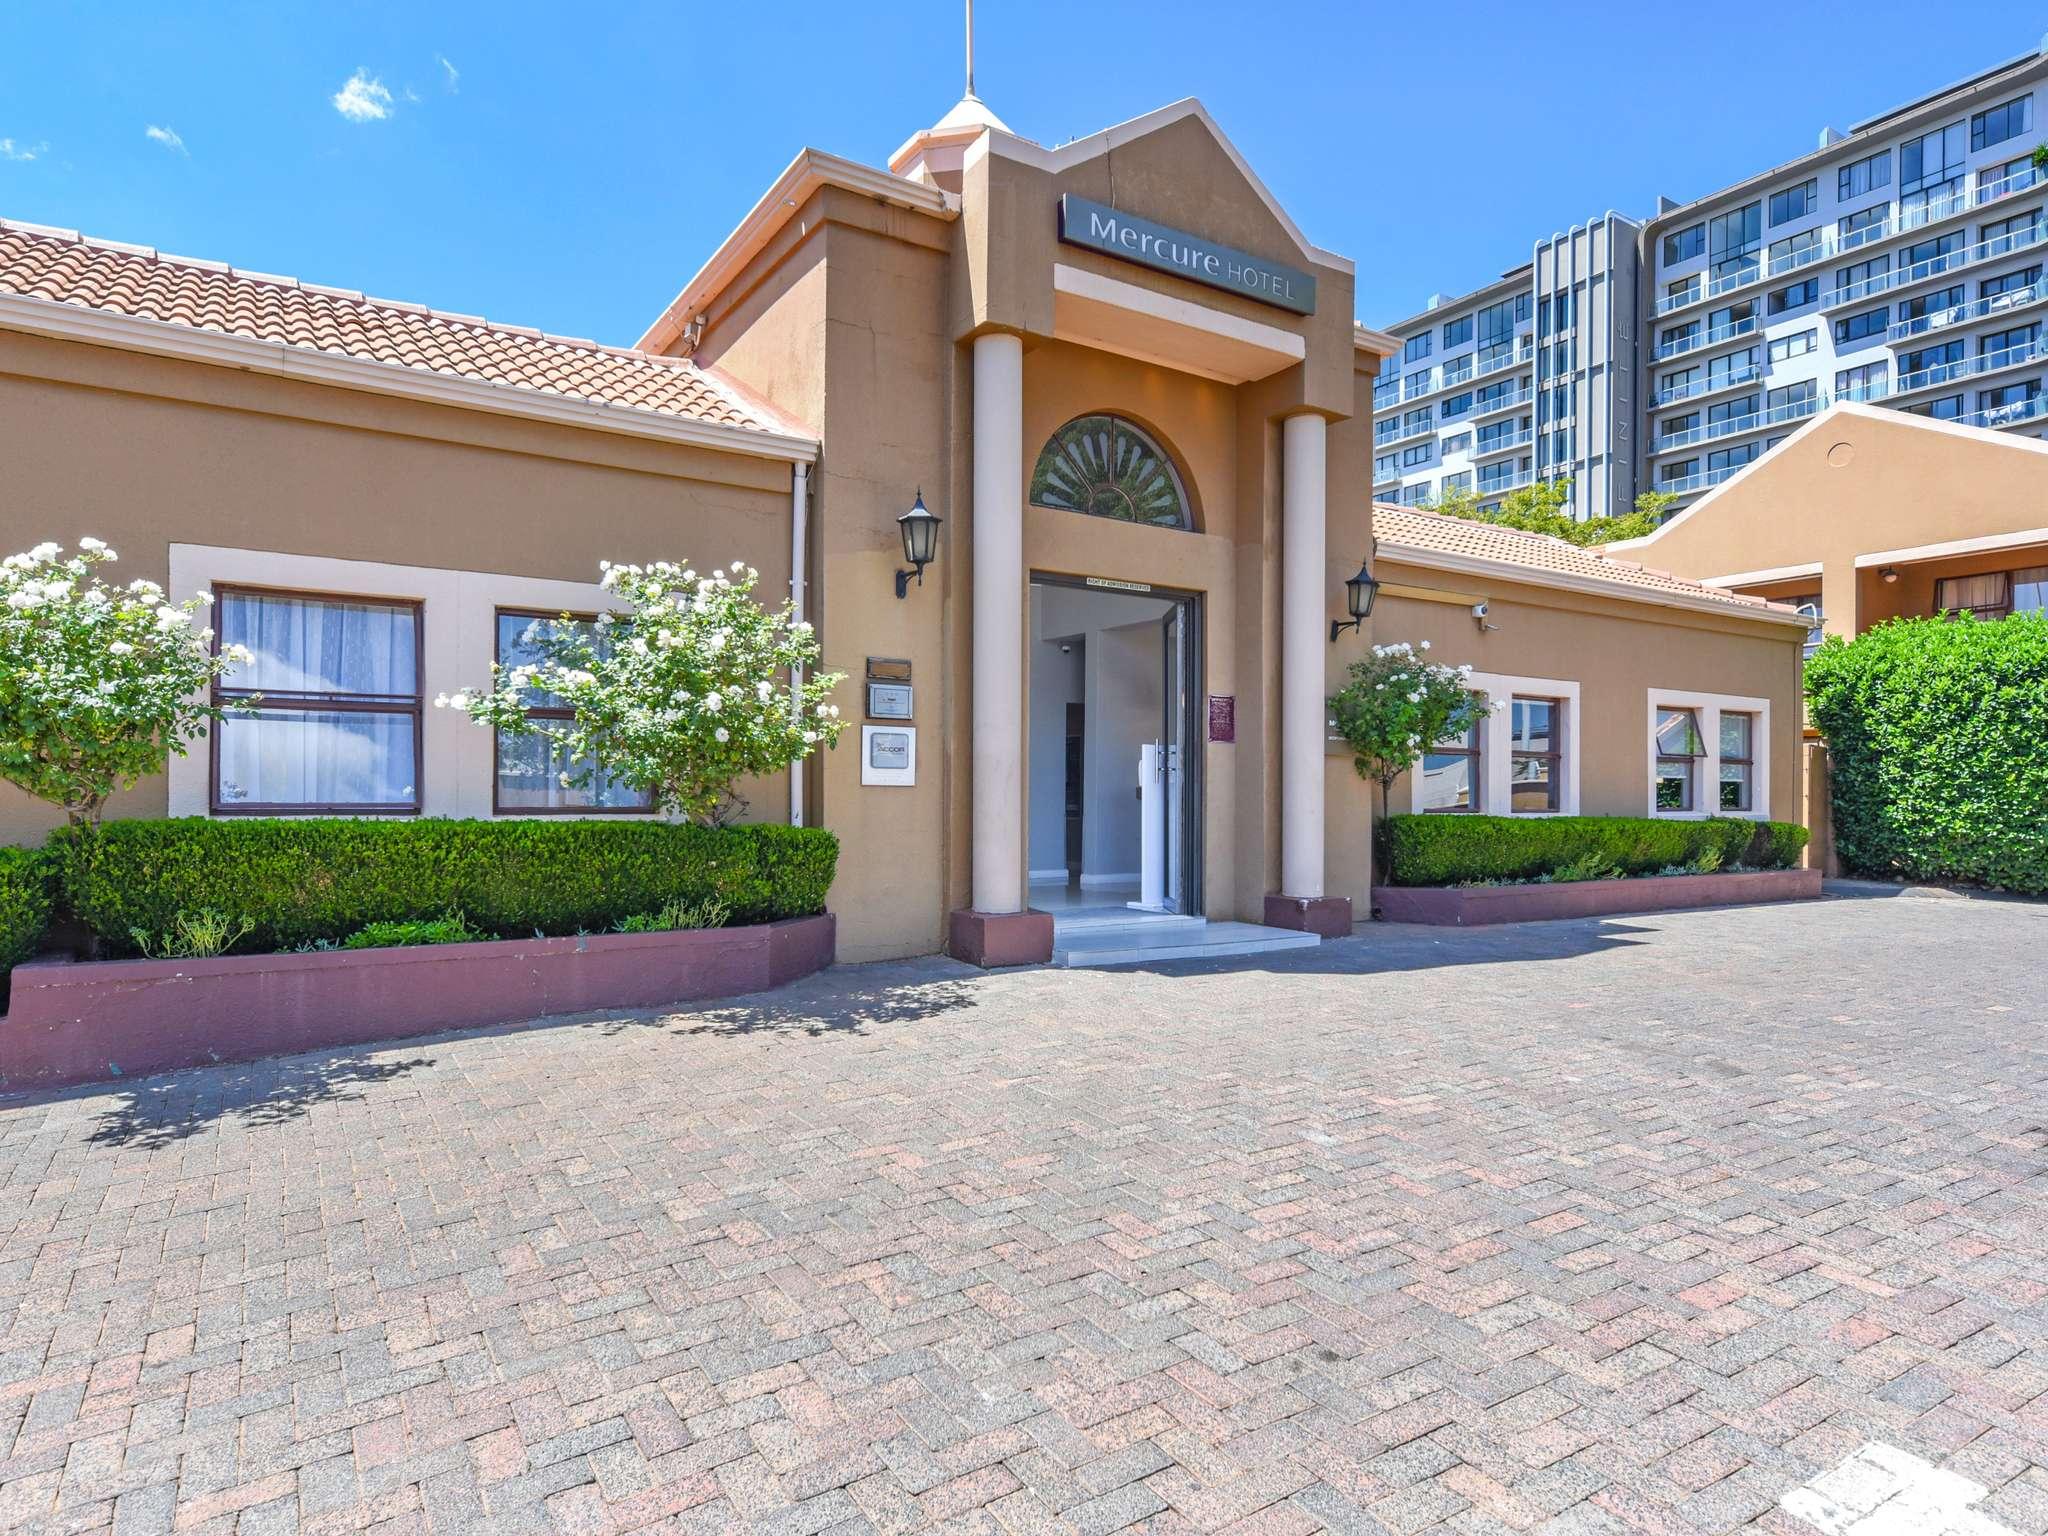 Hotel – Mercure Johannesburg Bedfordview Hotel